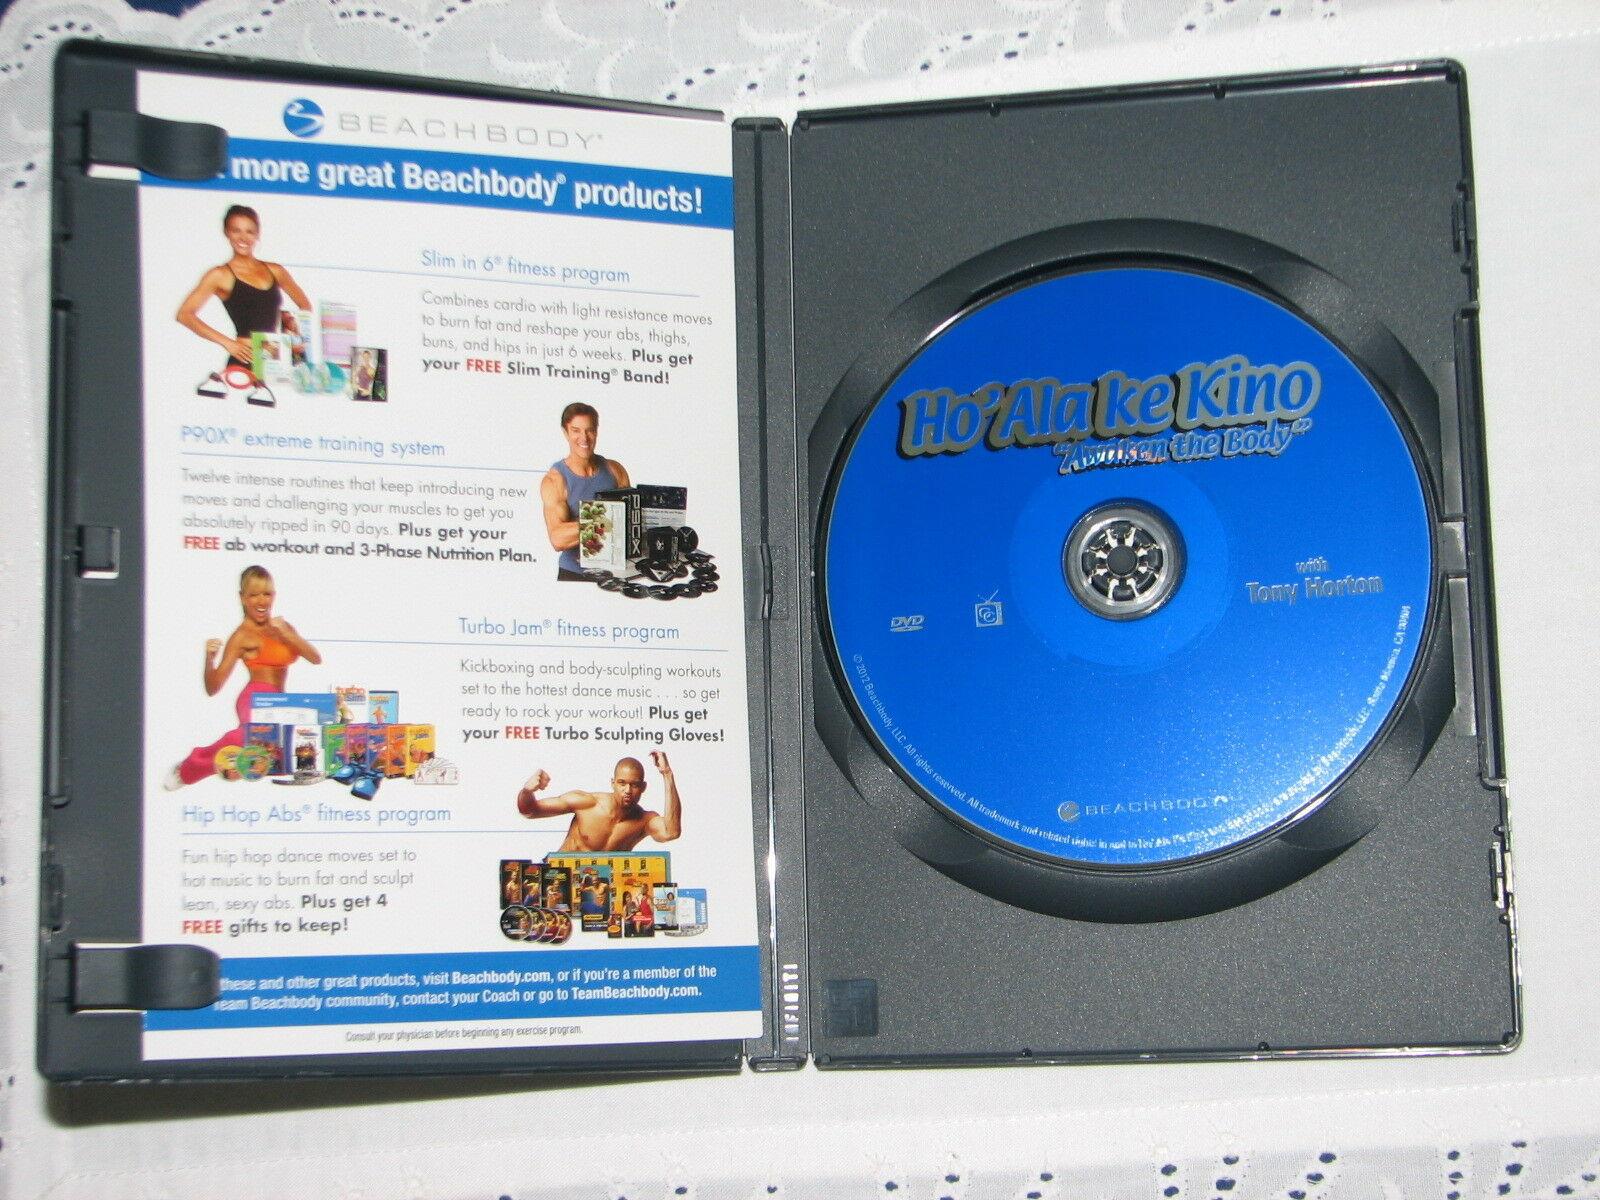 Two Tony Horton DVD's POWER 90 FAT BURNING SYSTEM HO'ALAKE KINO AWAKEN THE BODY image 6